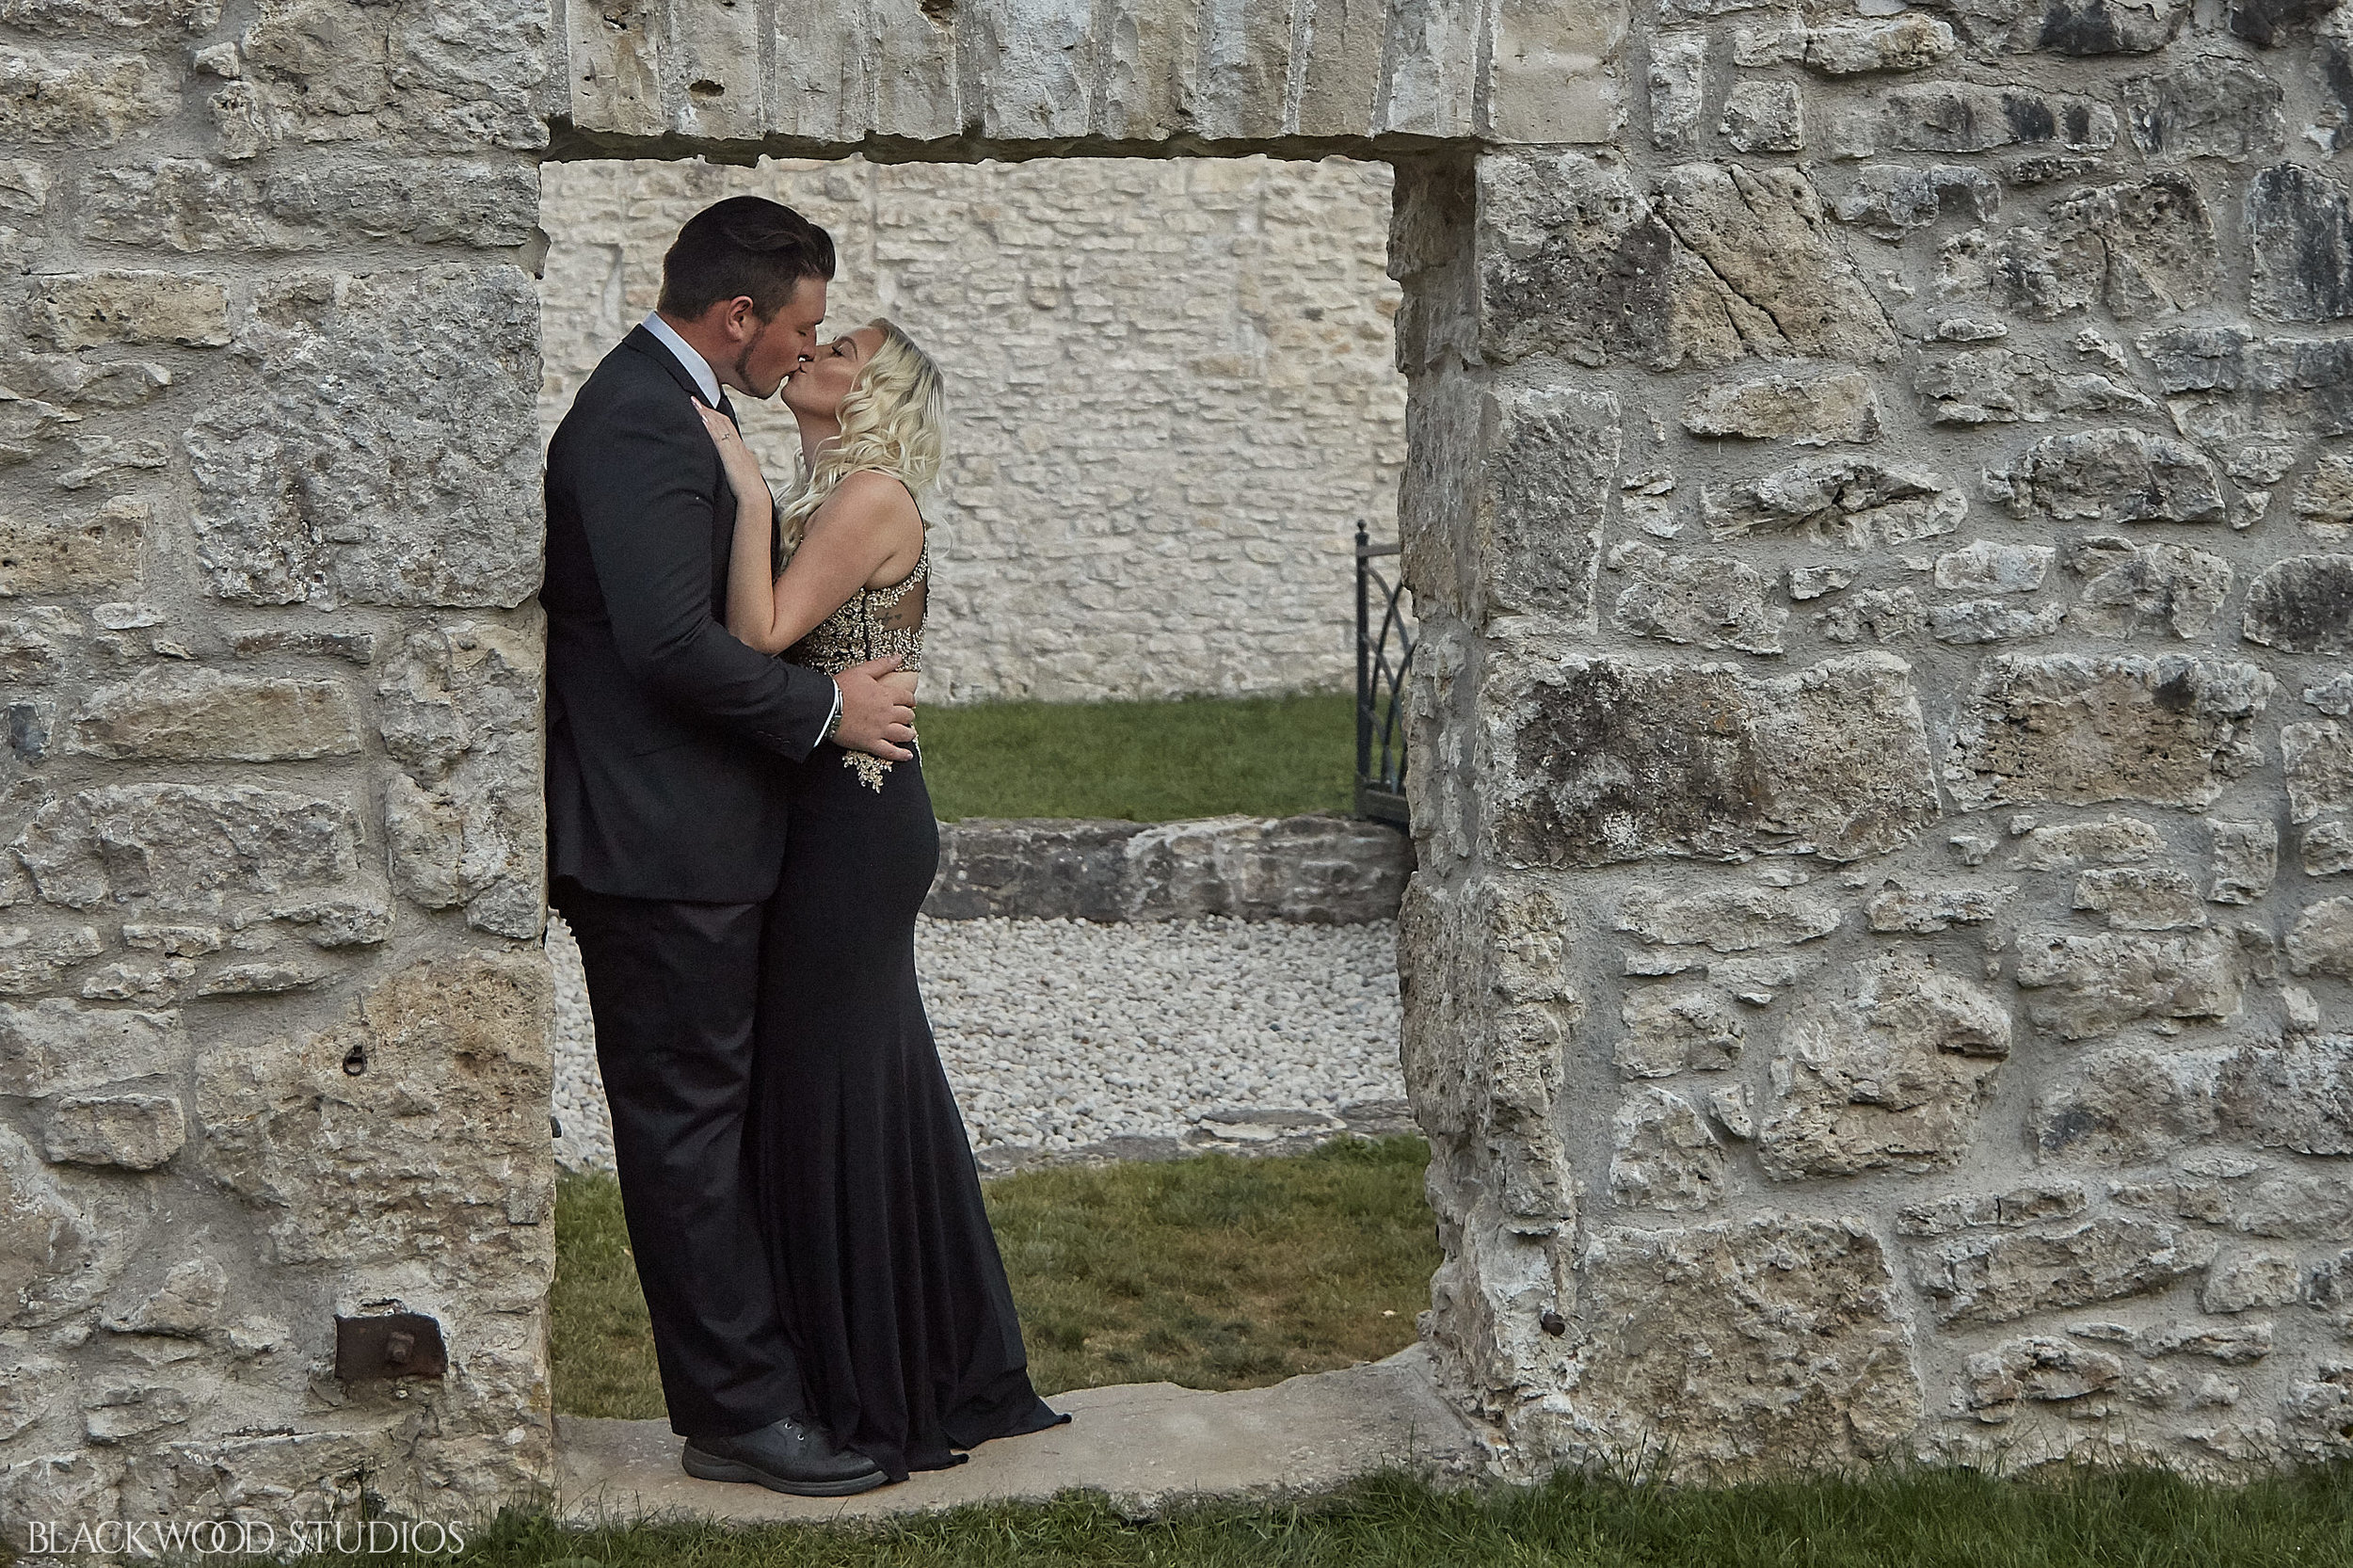 20171001 18-26-50 Nickee and Adam Engagement 0084.jpg